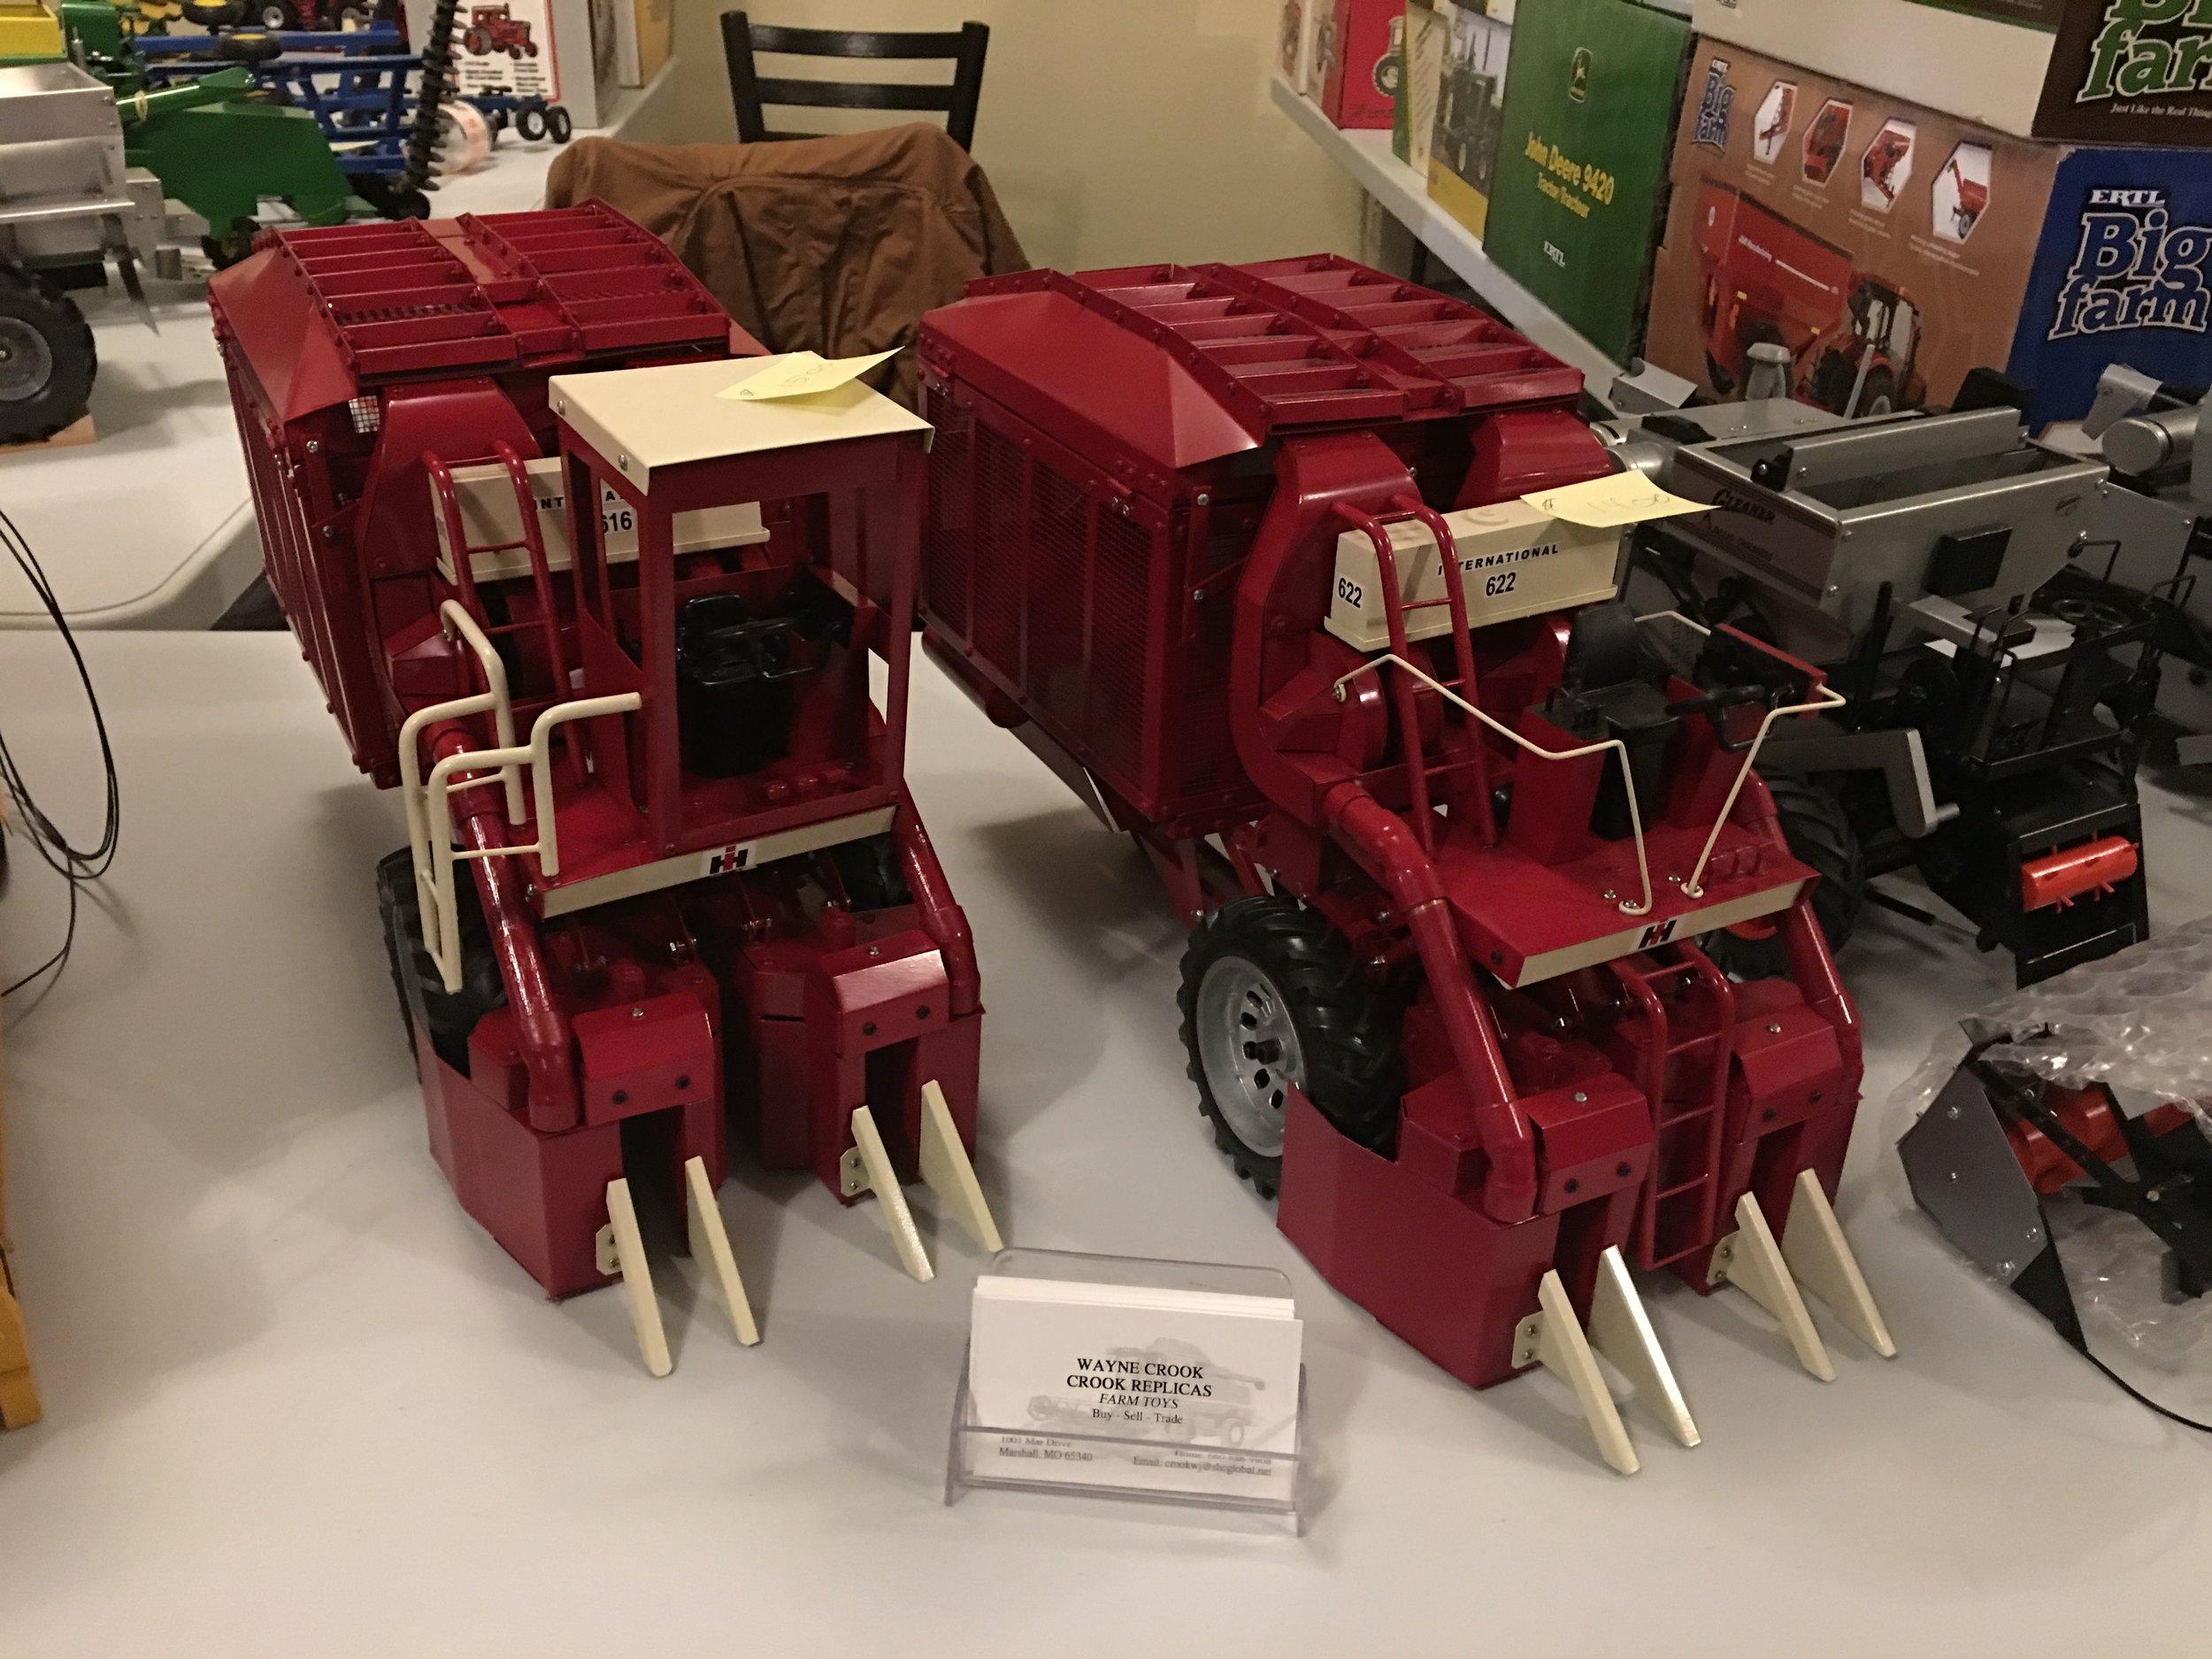 Wayne Crook's beautiful cotton pickers on display.